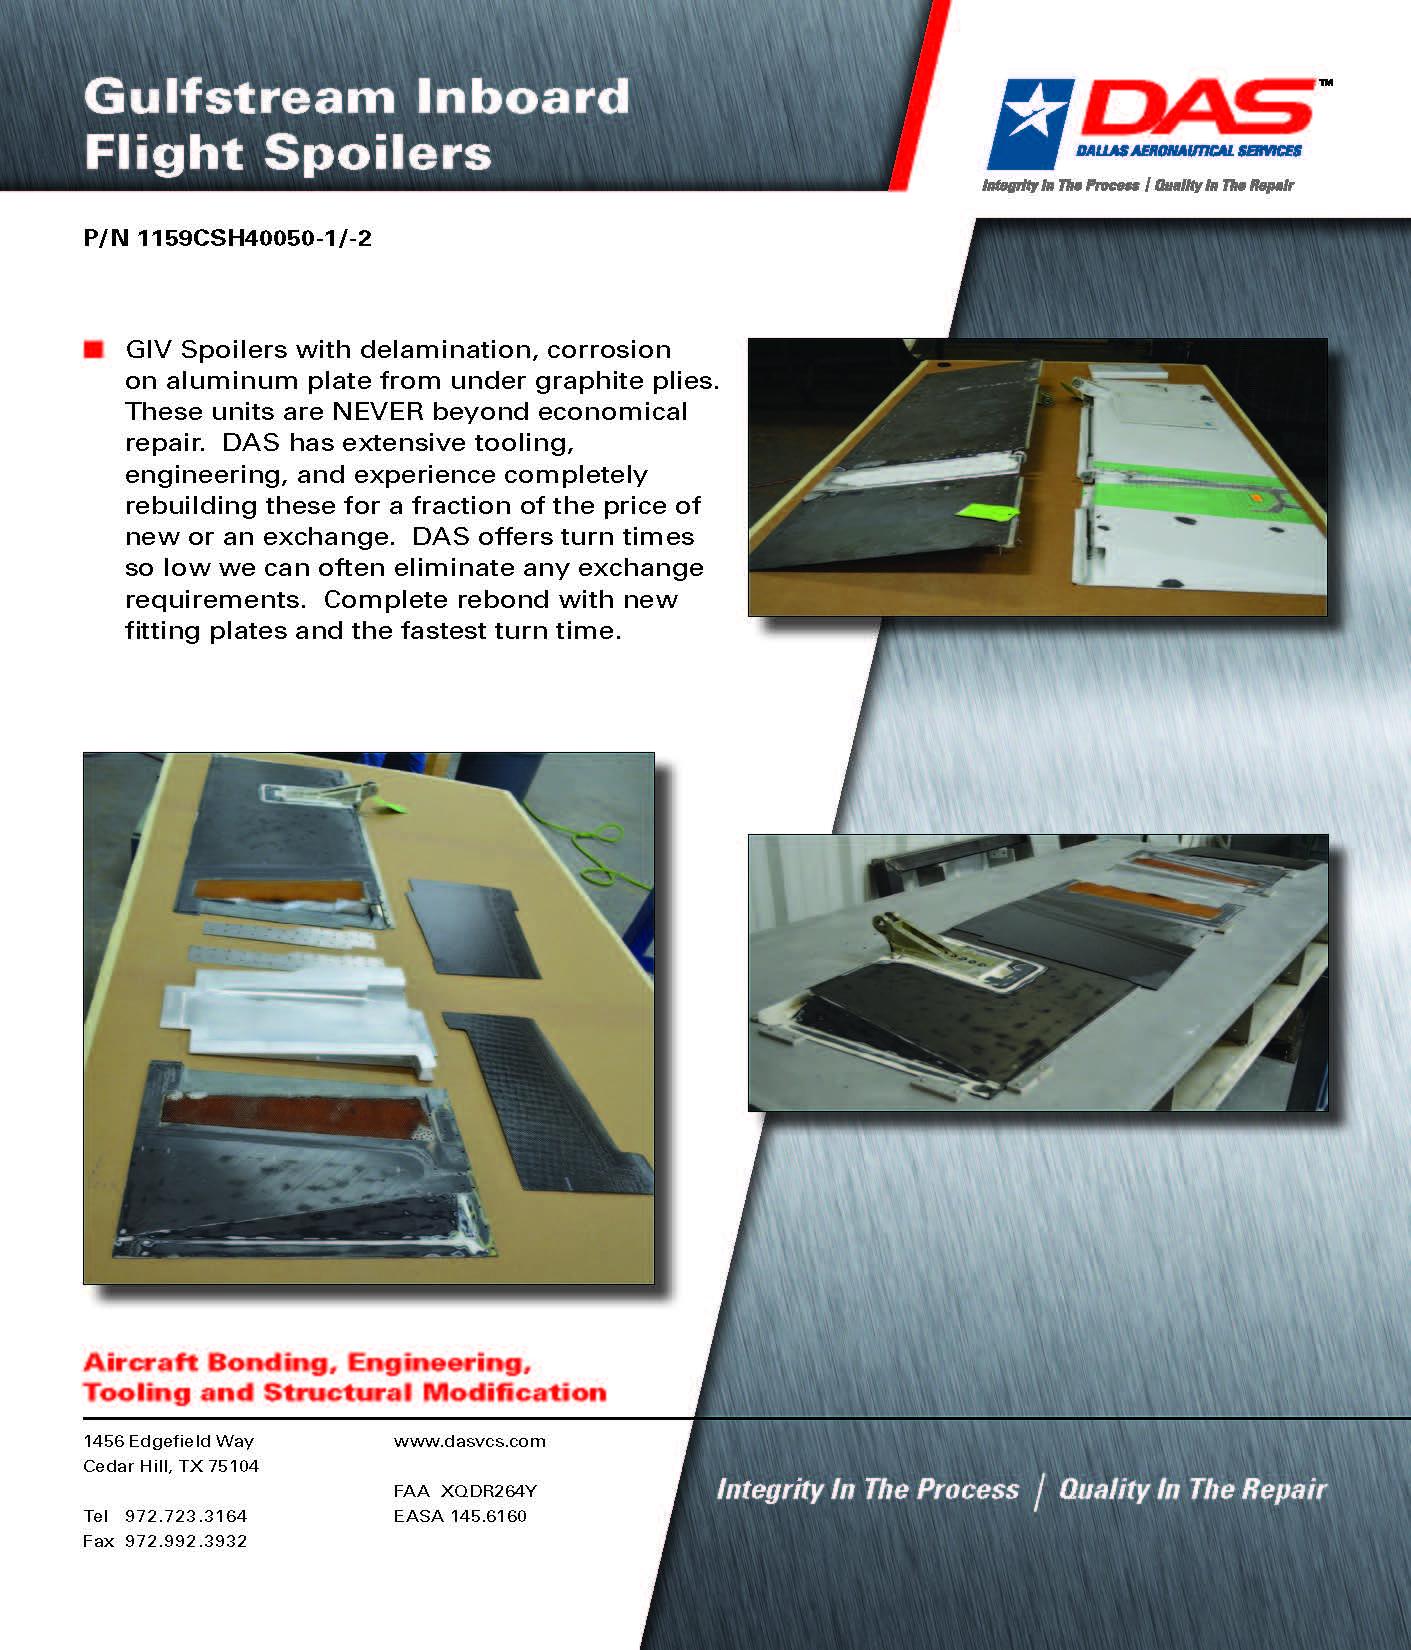 DAS-Gulfstream Spoilers sheet F4-LR corp.jpg